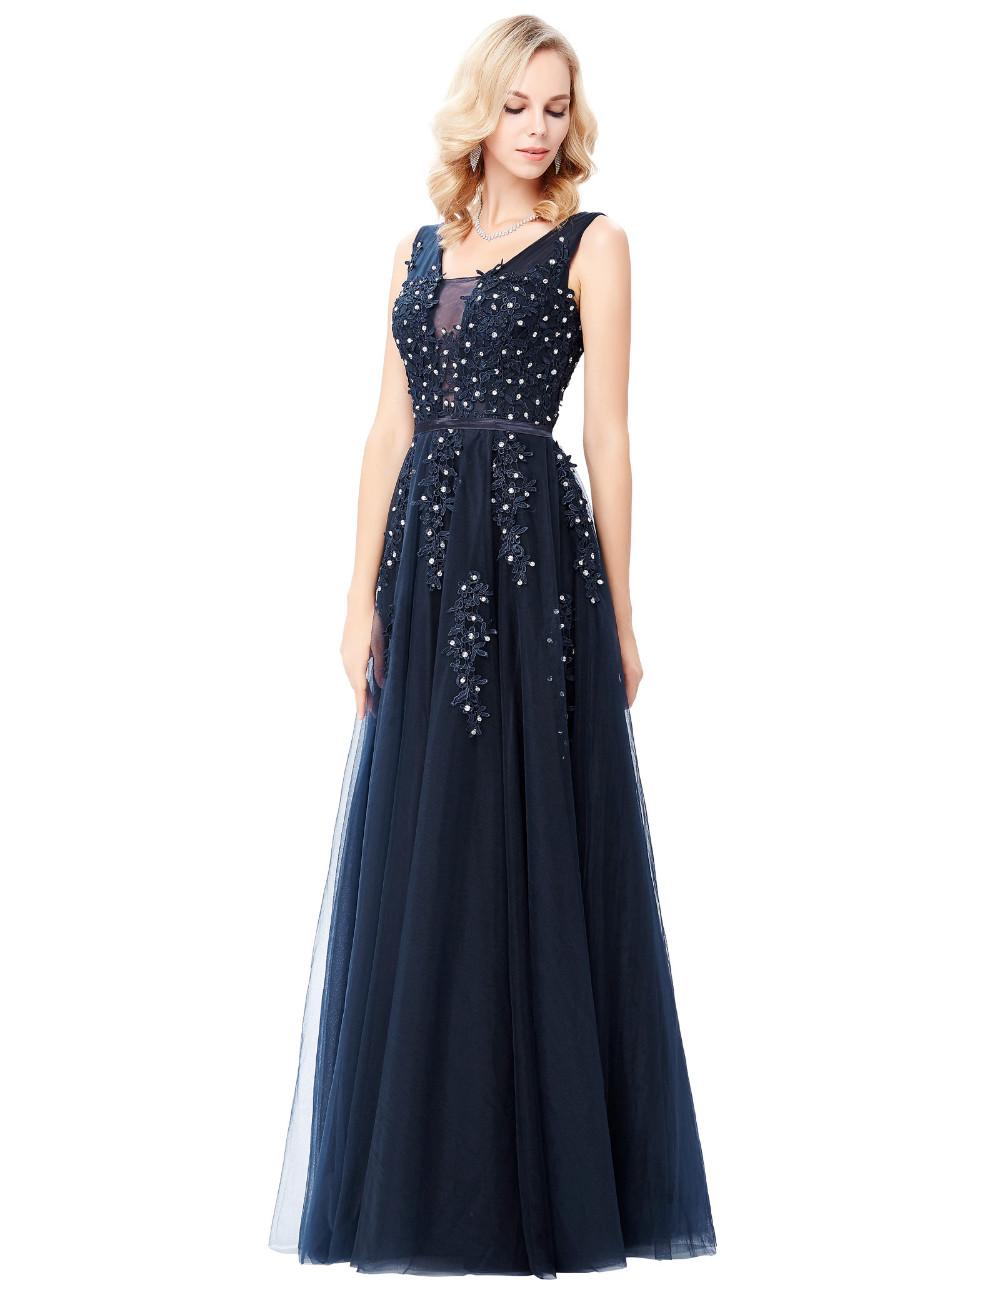 Grace Karin Tulle Appliques Celebrity Prom Dress Sexy V Back Sleeveless Long Royal Blue Robes De Soiree 2017 Longue Prom Dresses 13